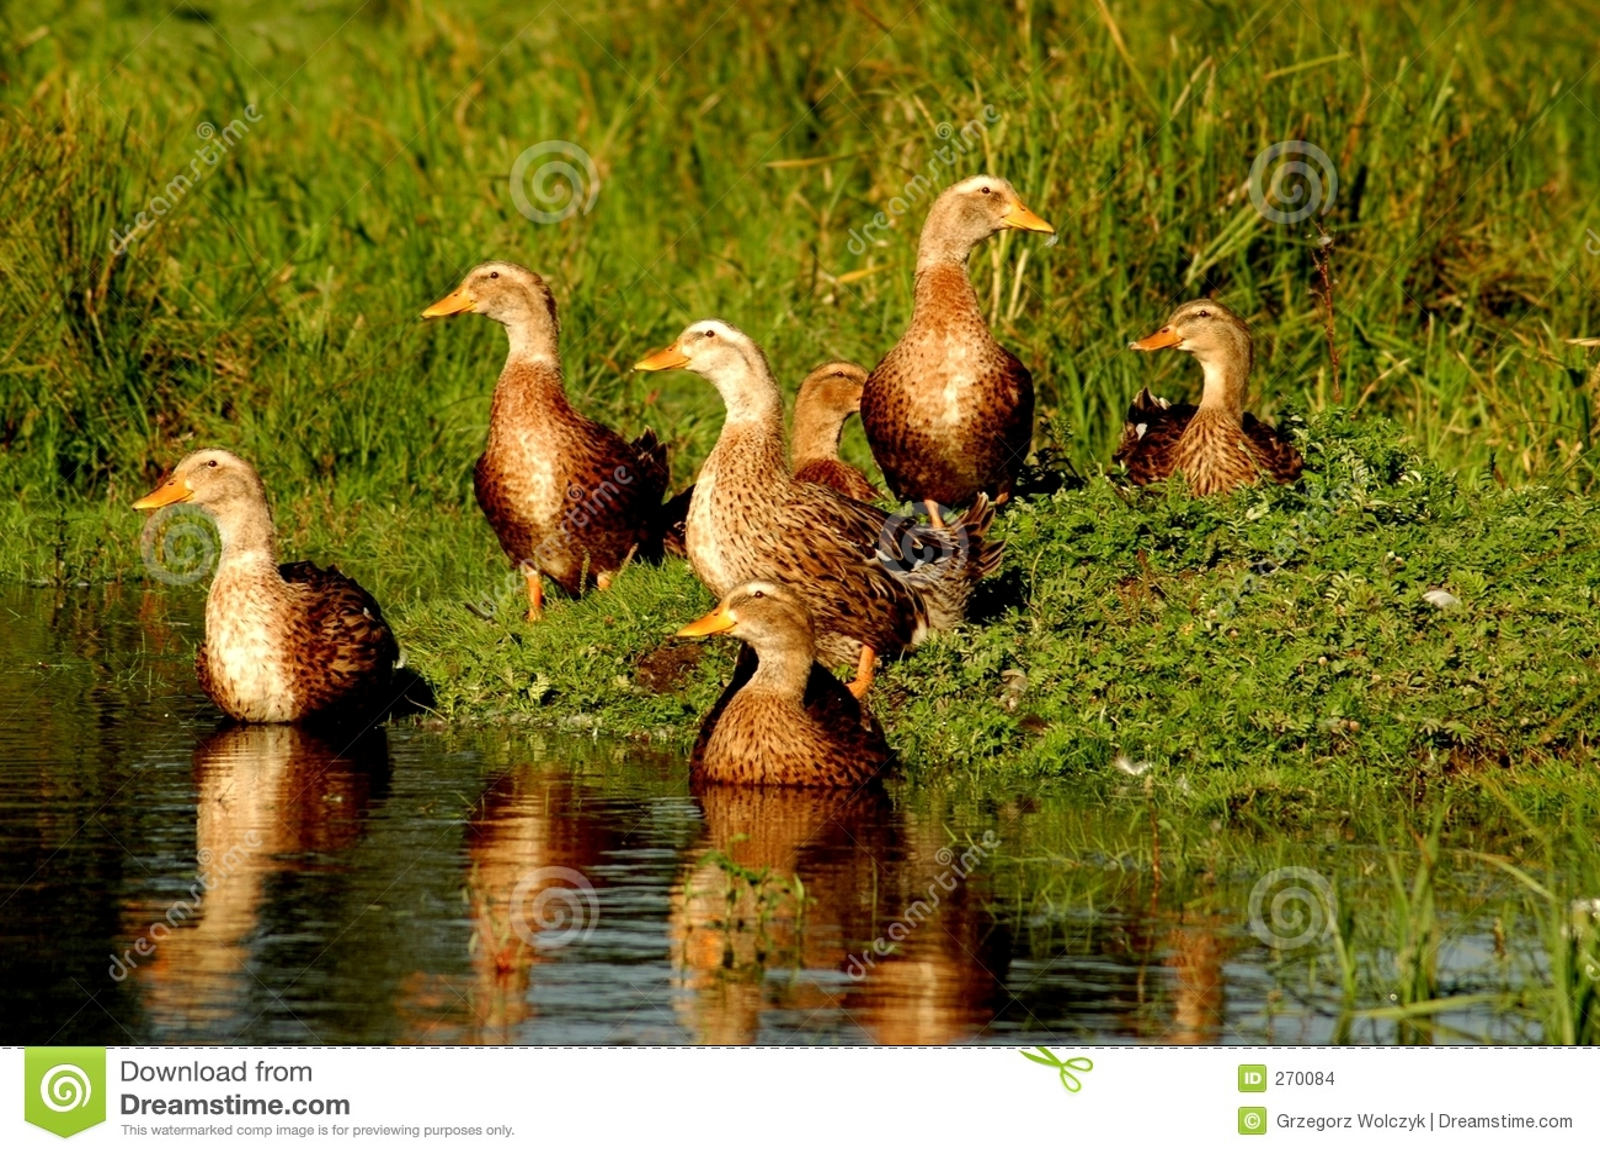 Dack Stock Images - Image: 270084